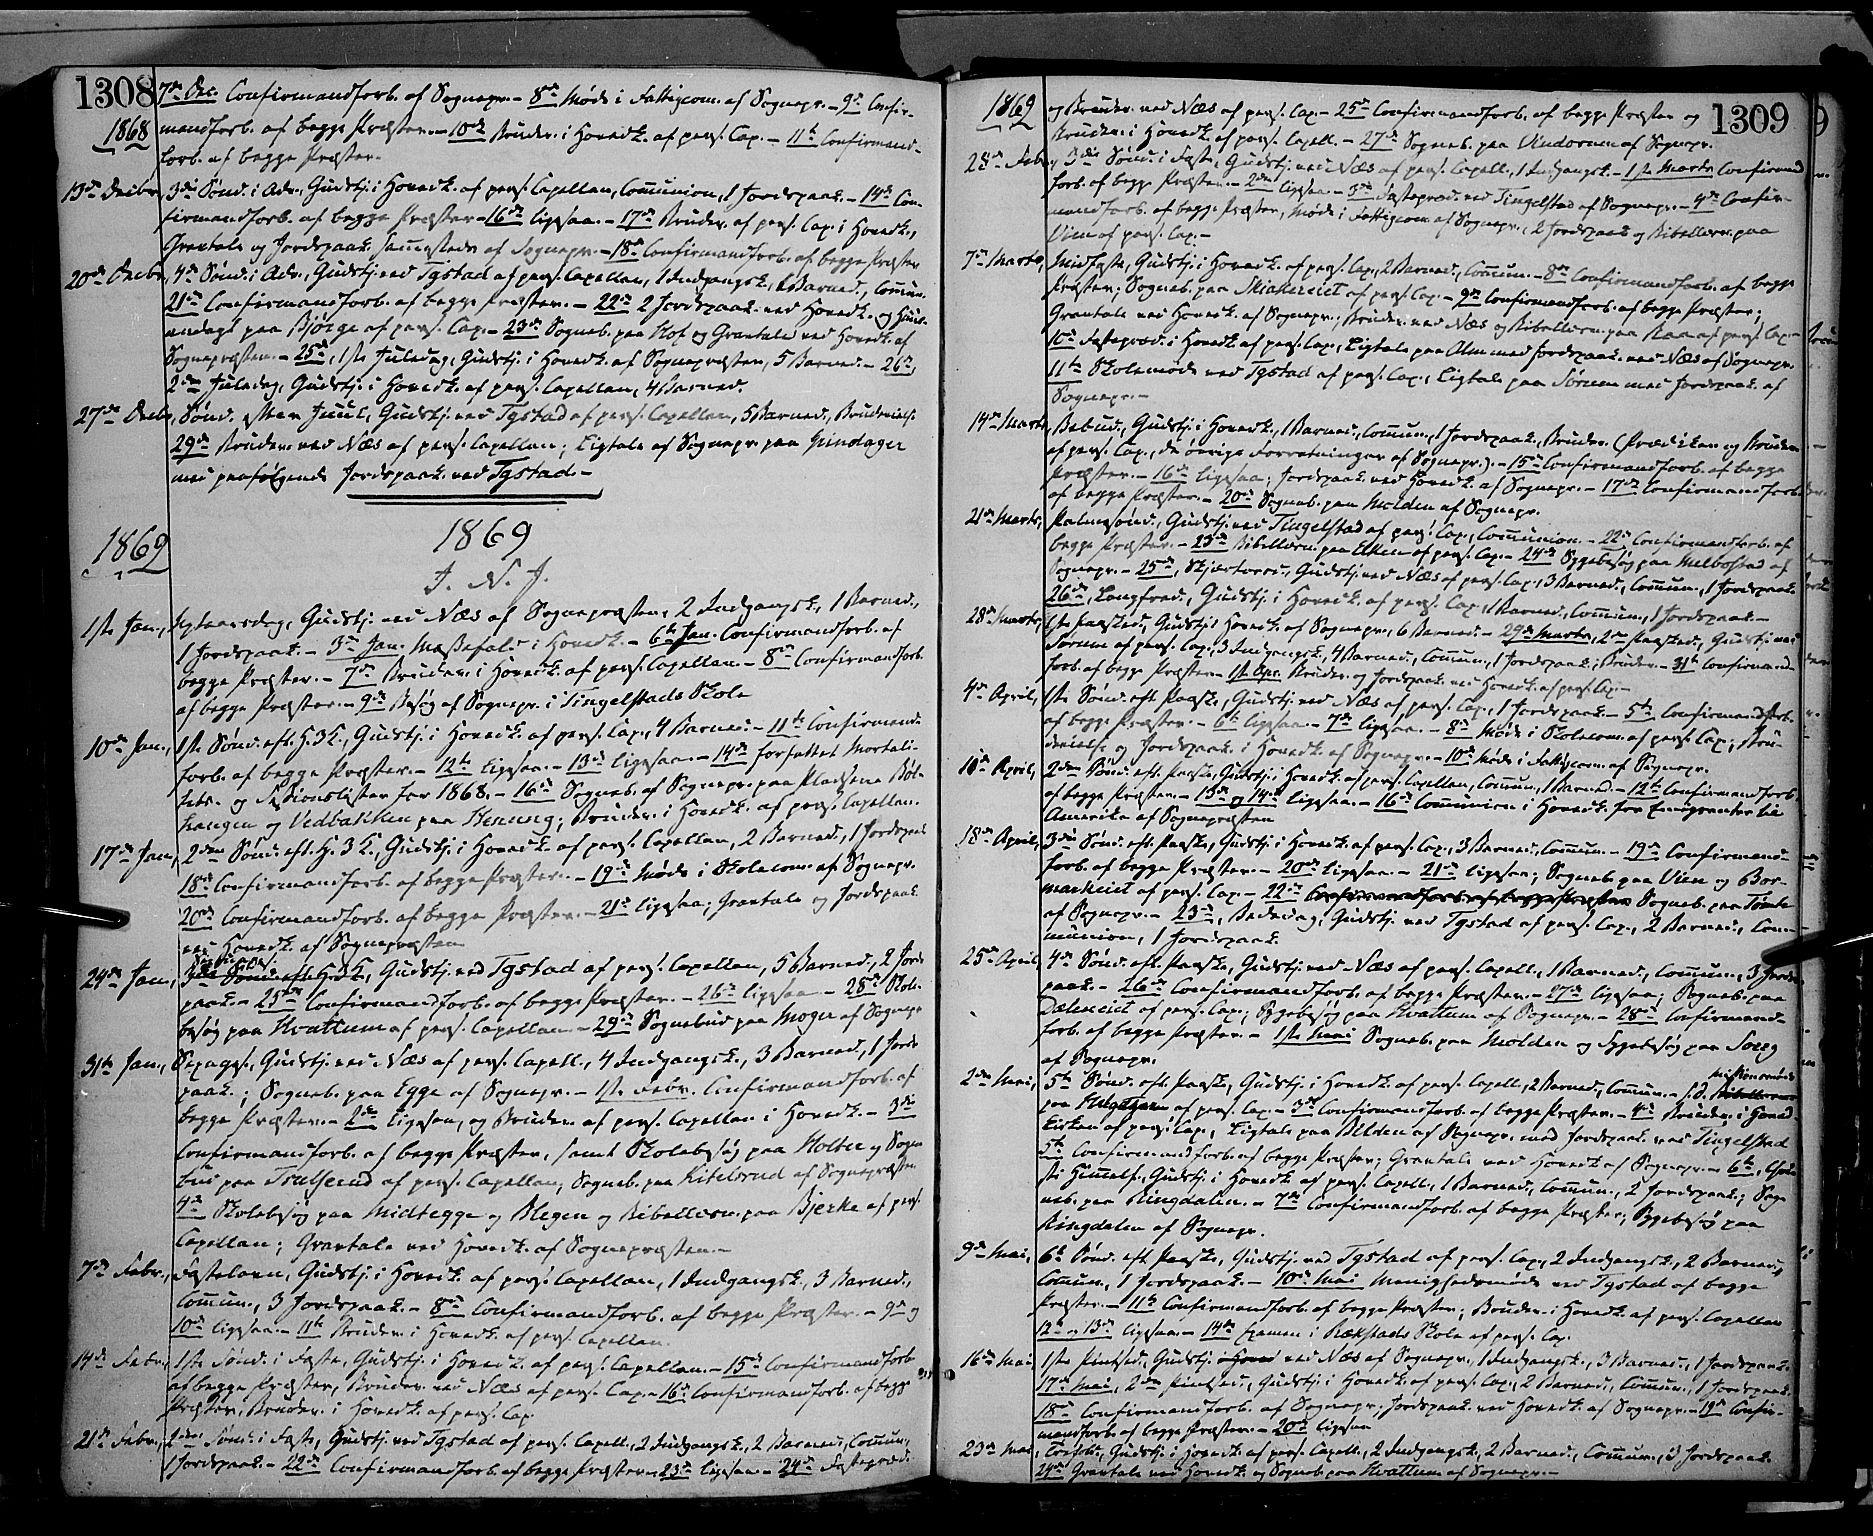 SAH, Gran prestekontor, Ministerialbok nr. 12, 1856-1874, s. 1308-1309